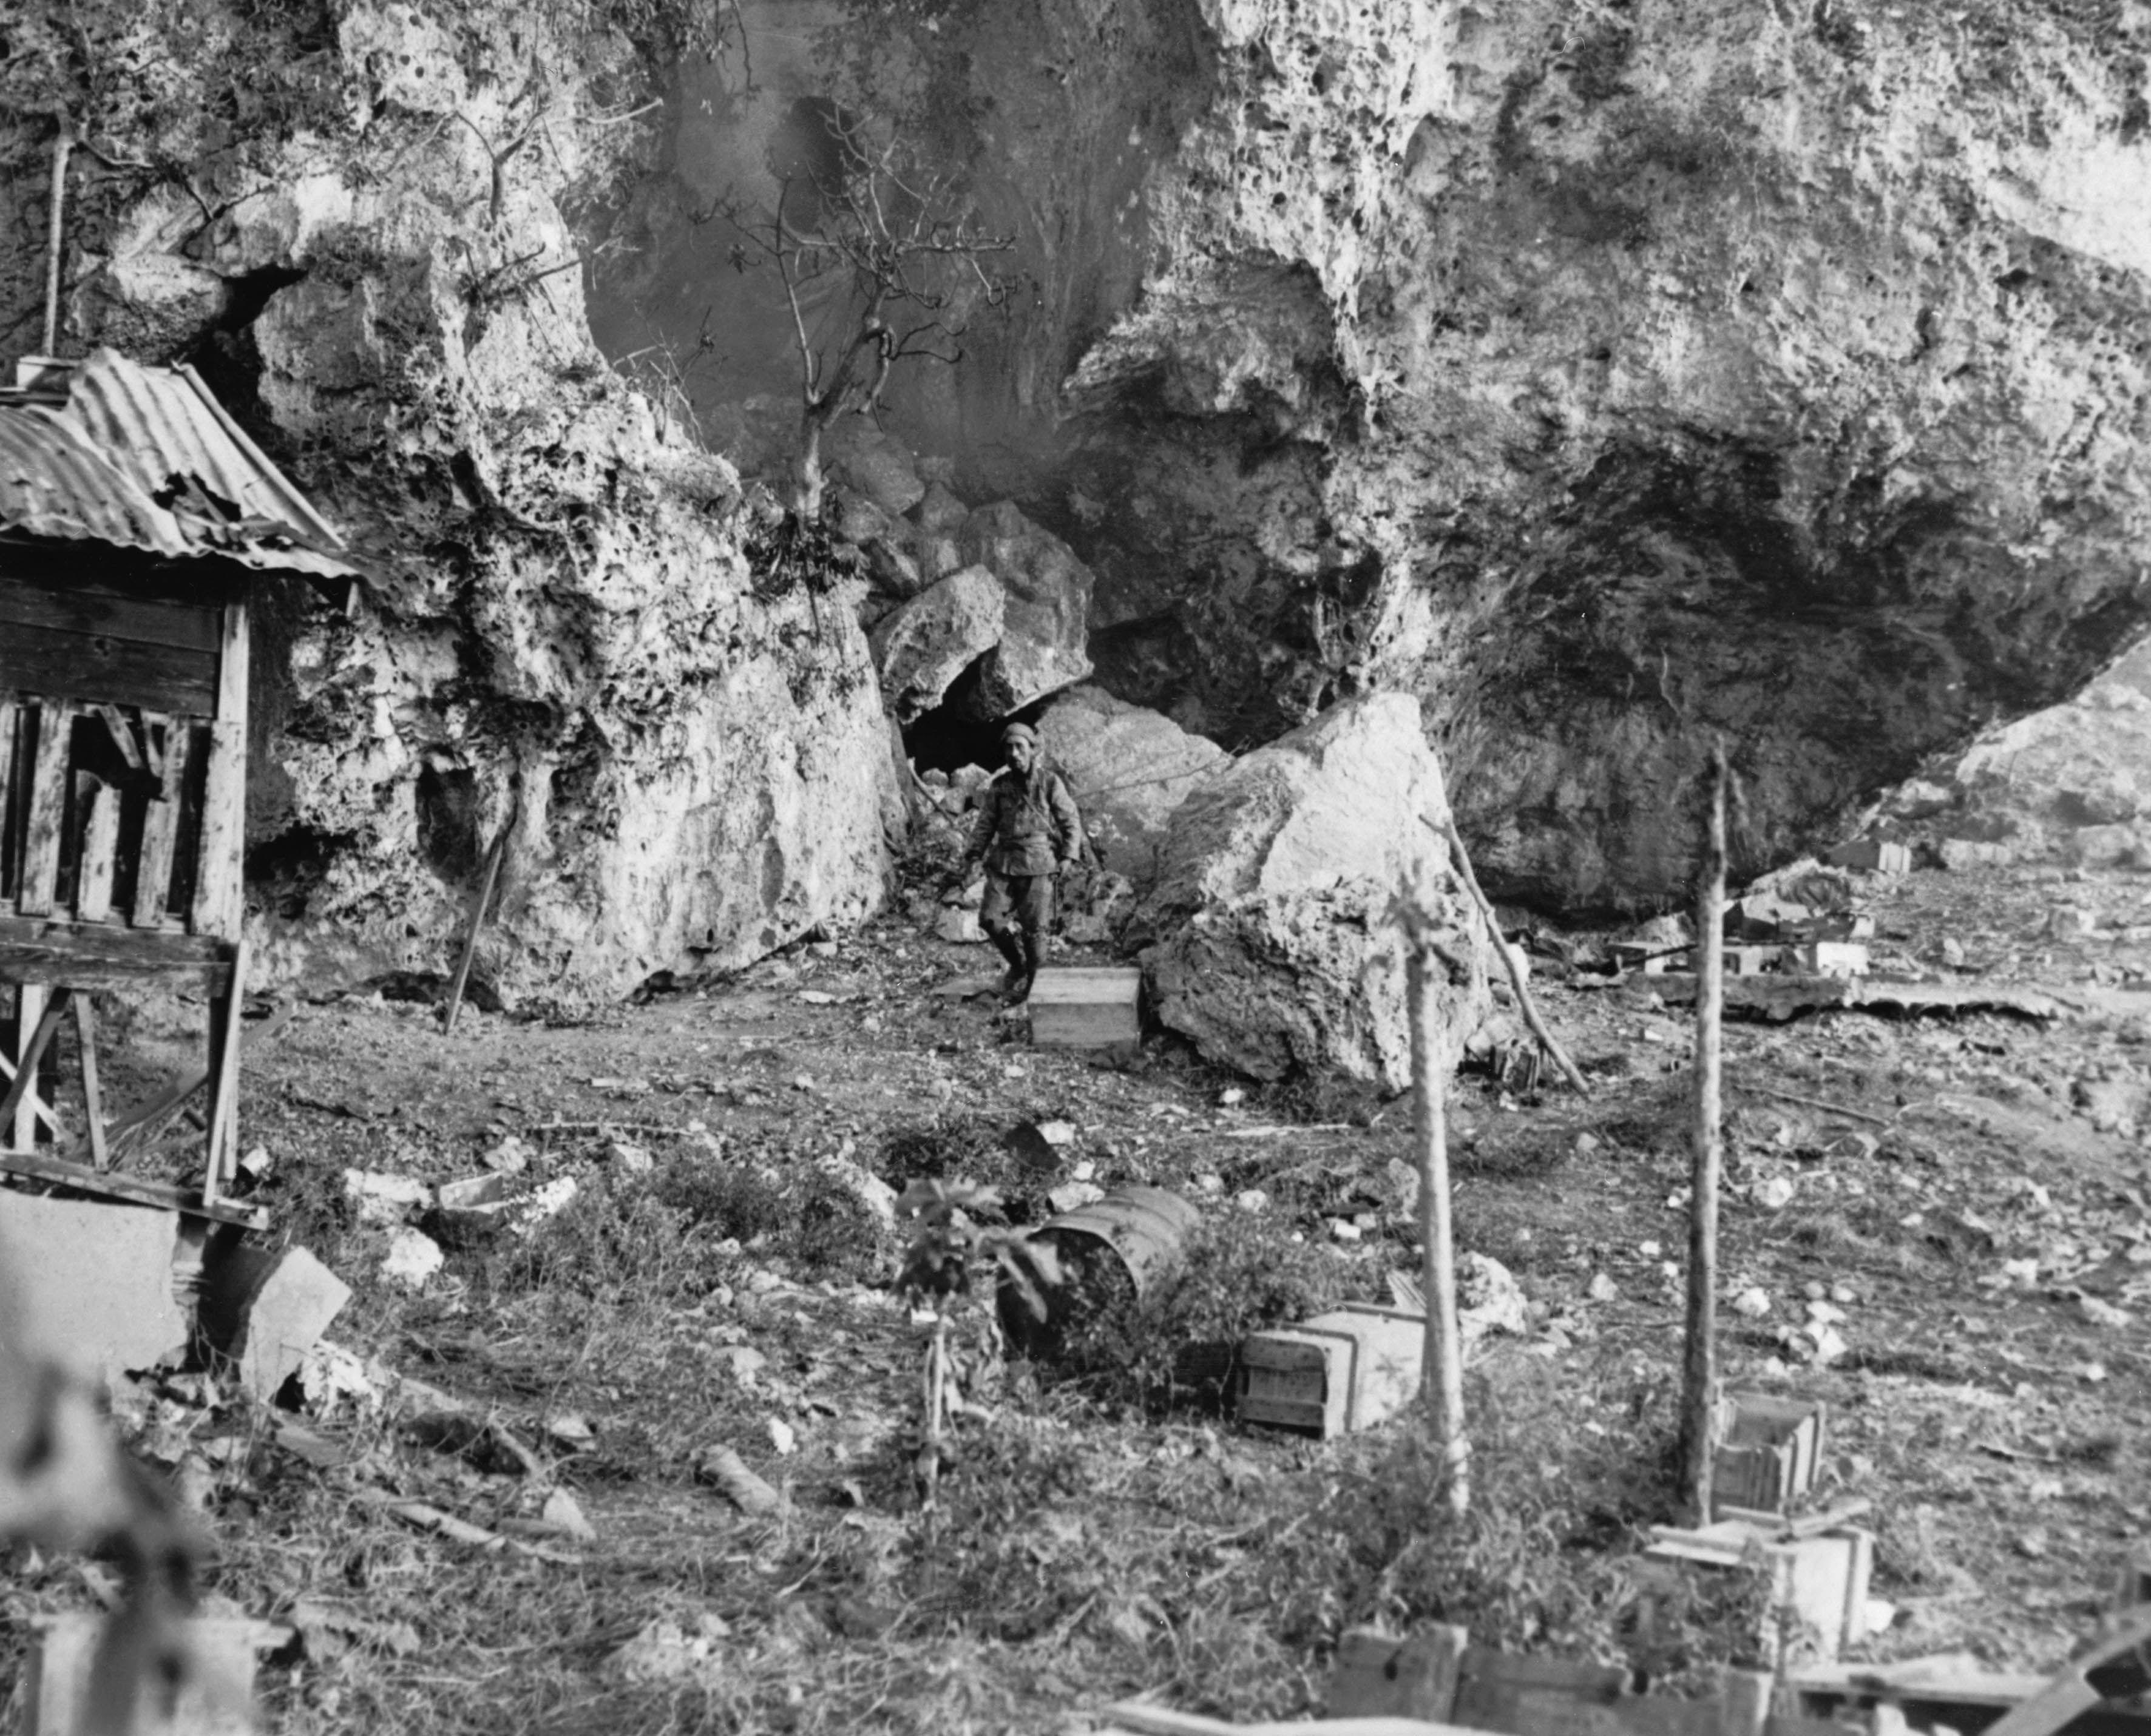 Japanese POW, Saipan